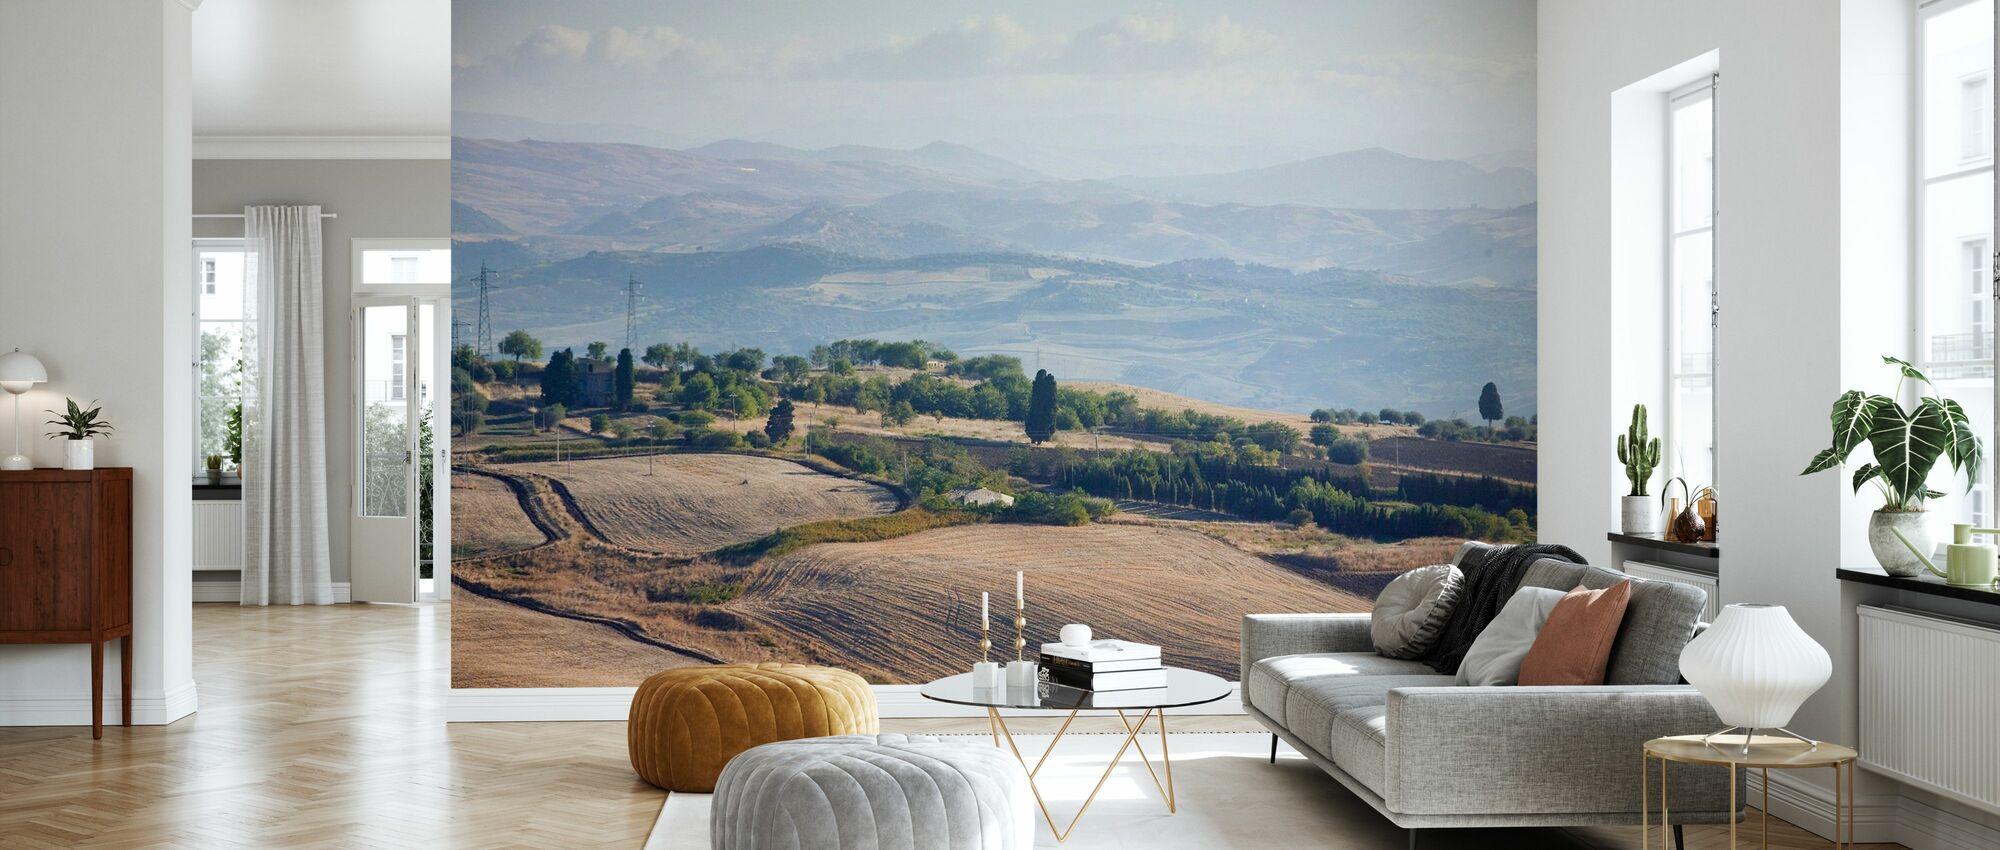 Fields of Sicily, Italy - Wallpaper - Living Room